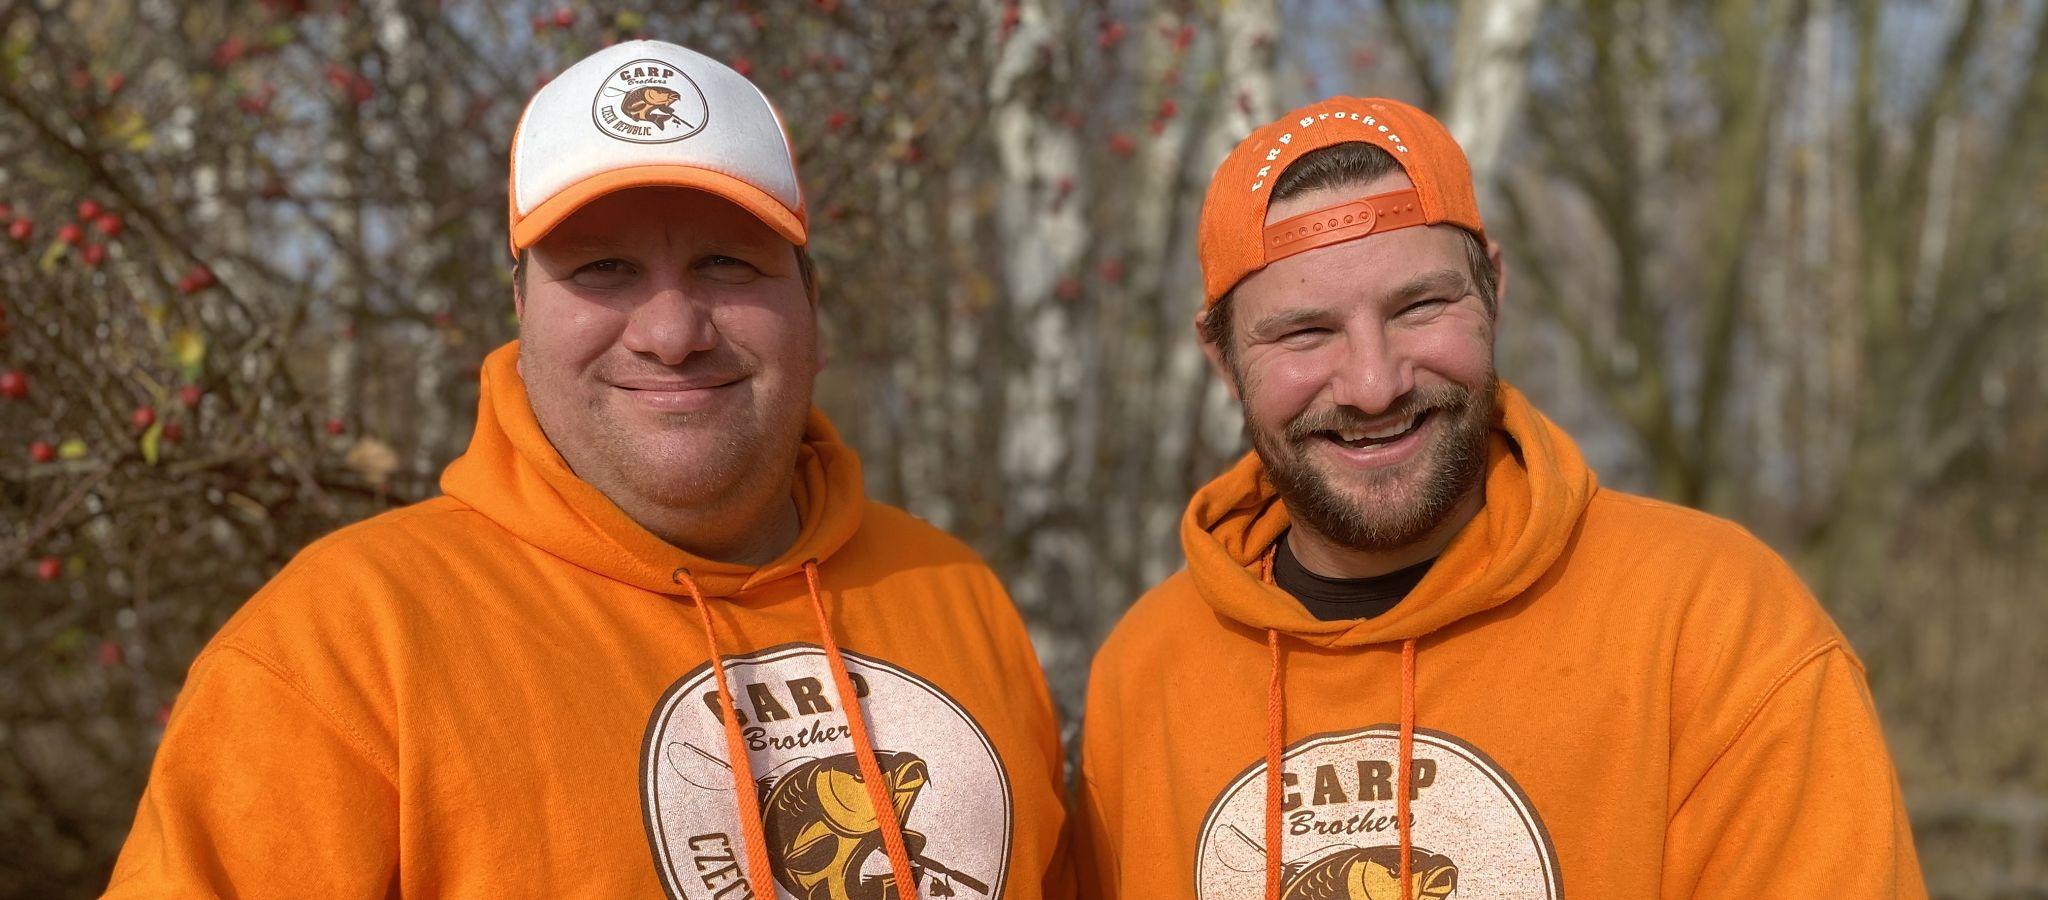 CARP Brothers Ondra Michal